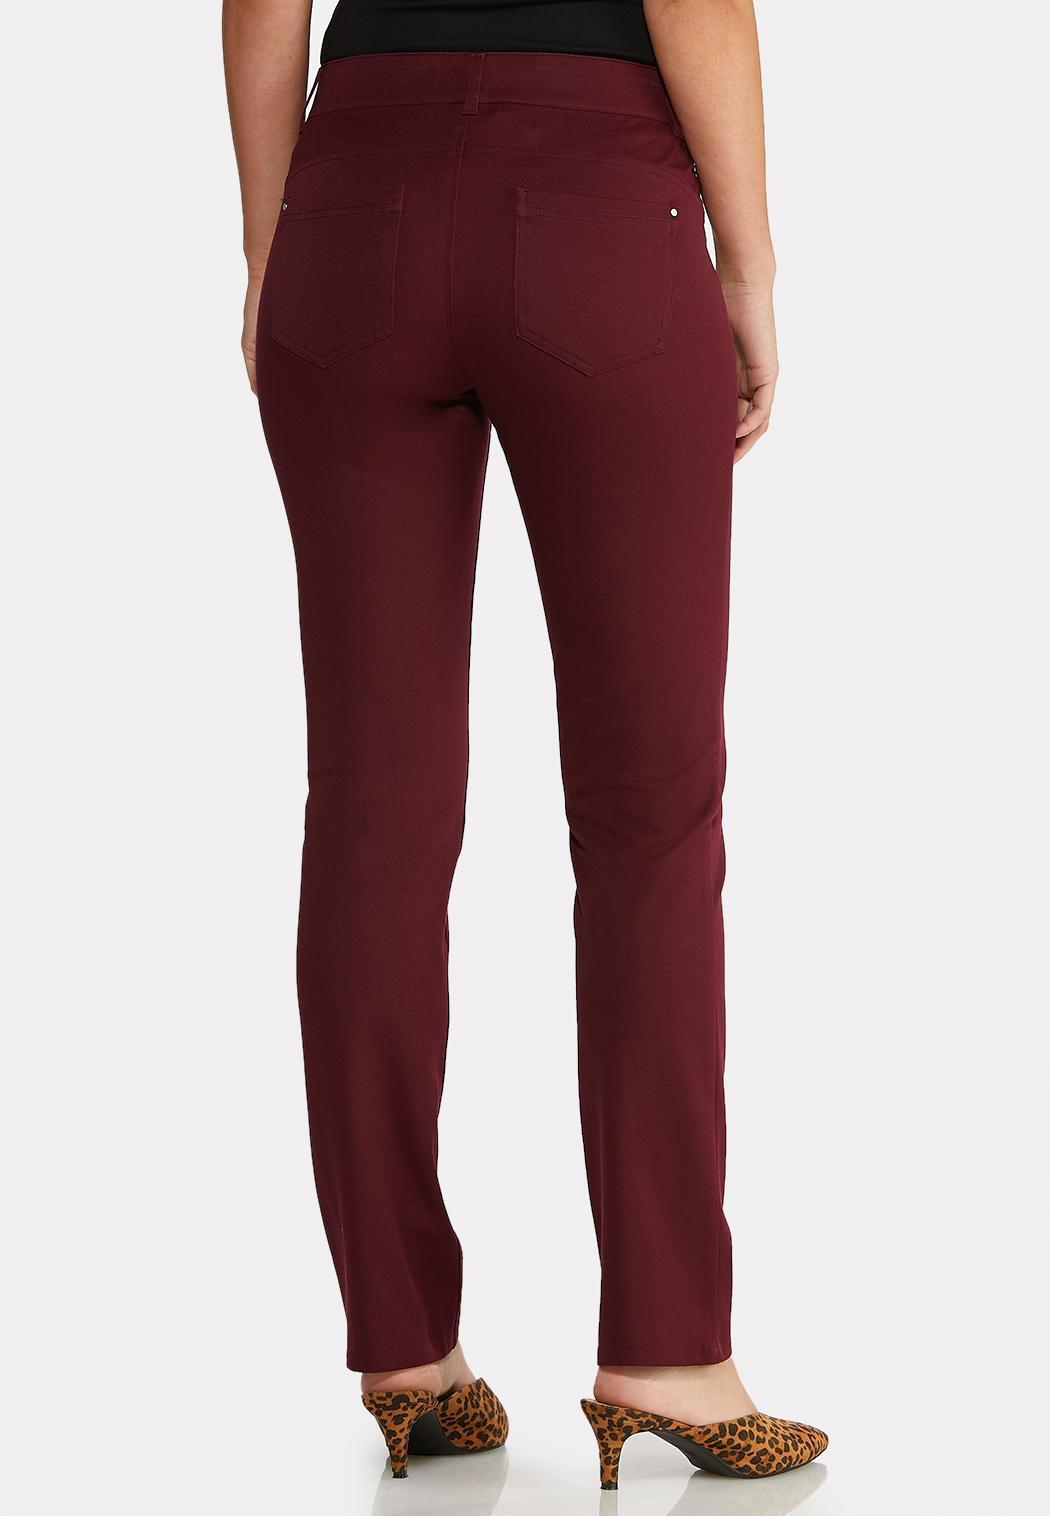 Everywhere Pants (Item #43955326)